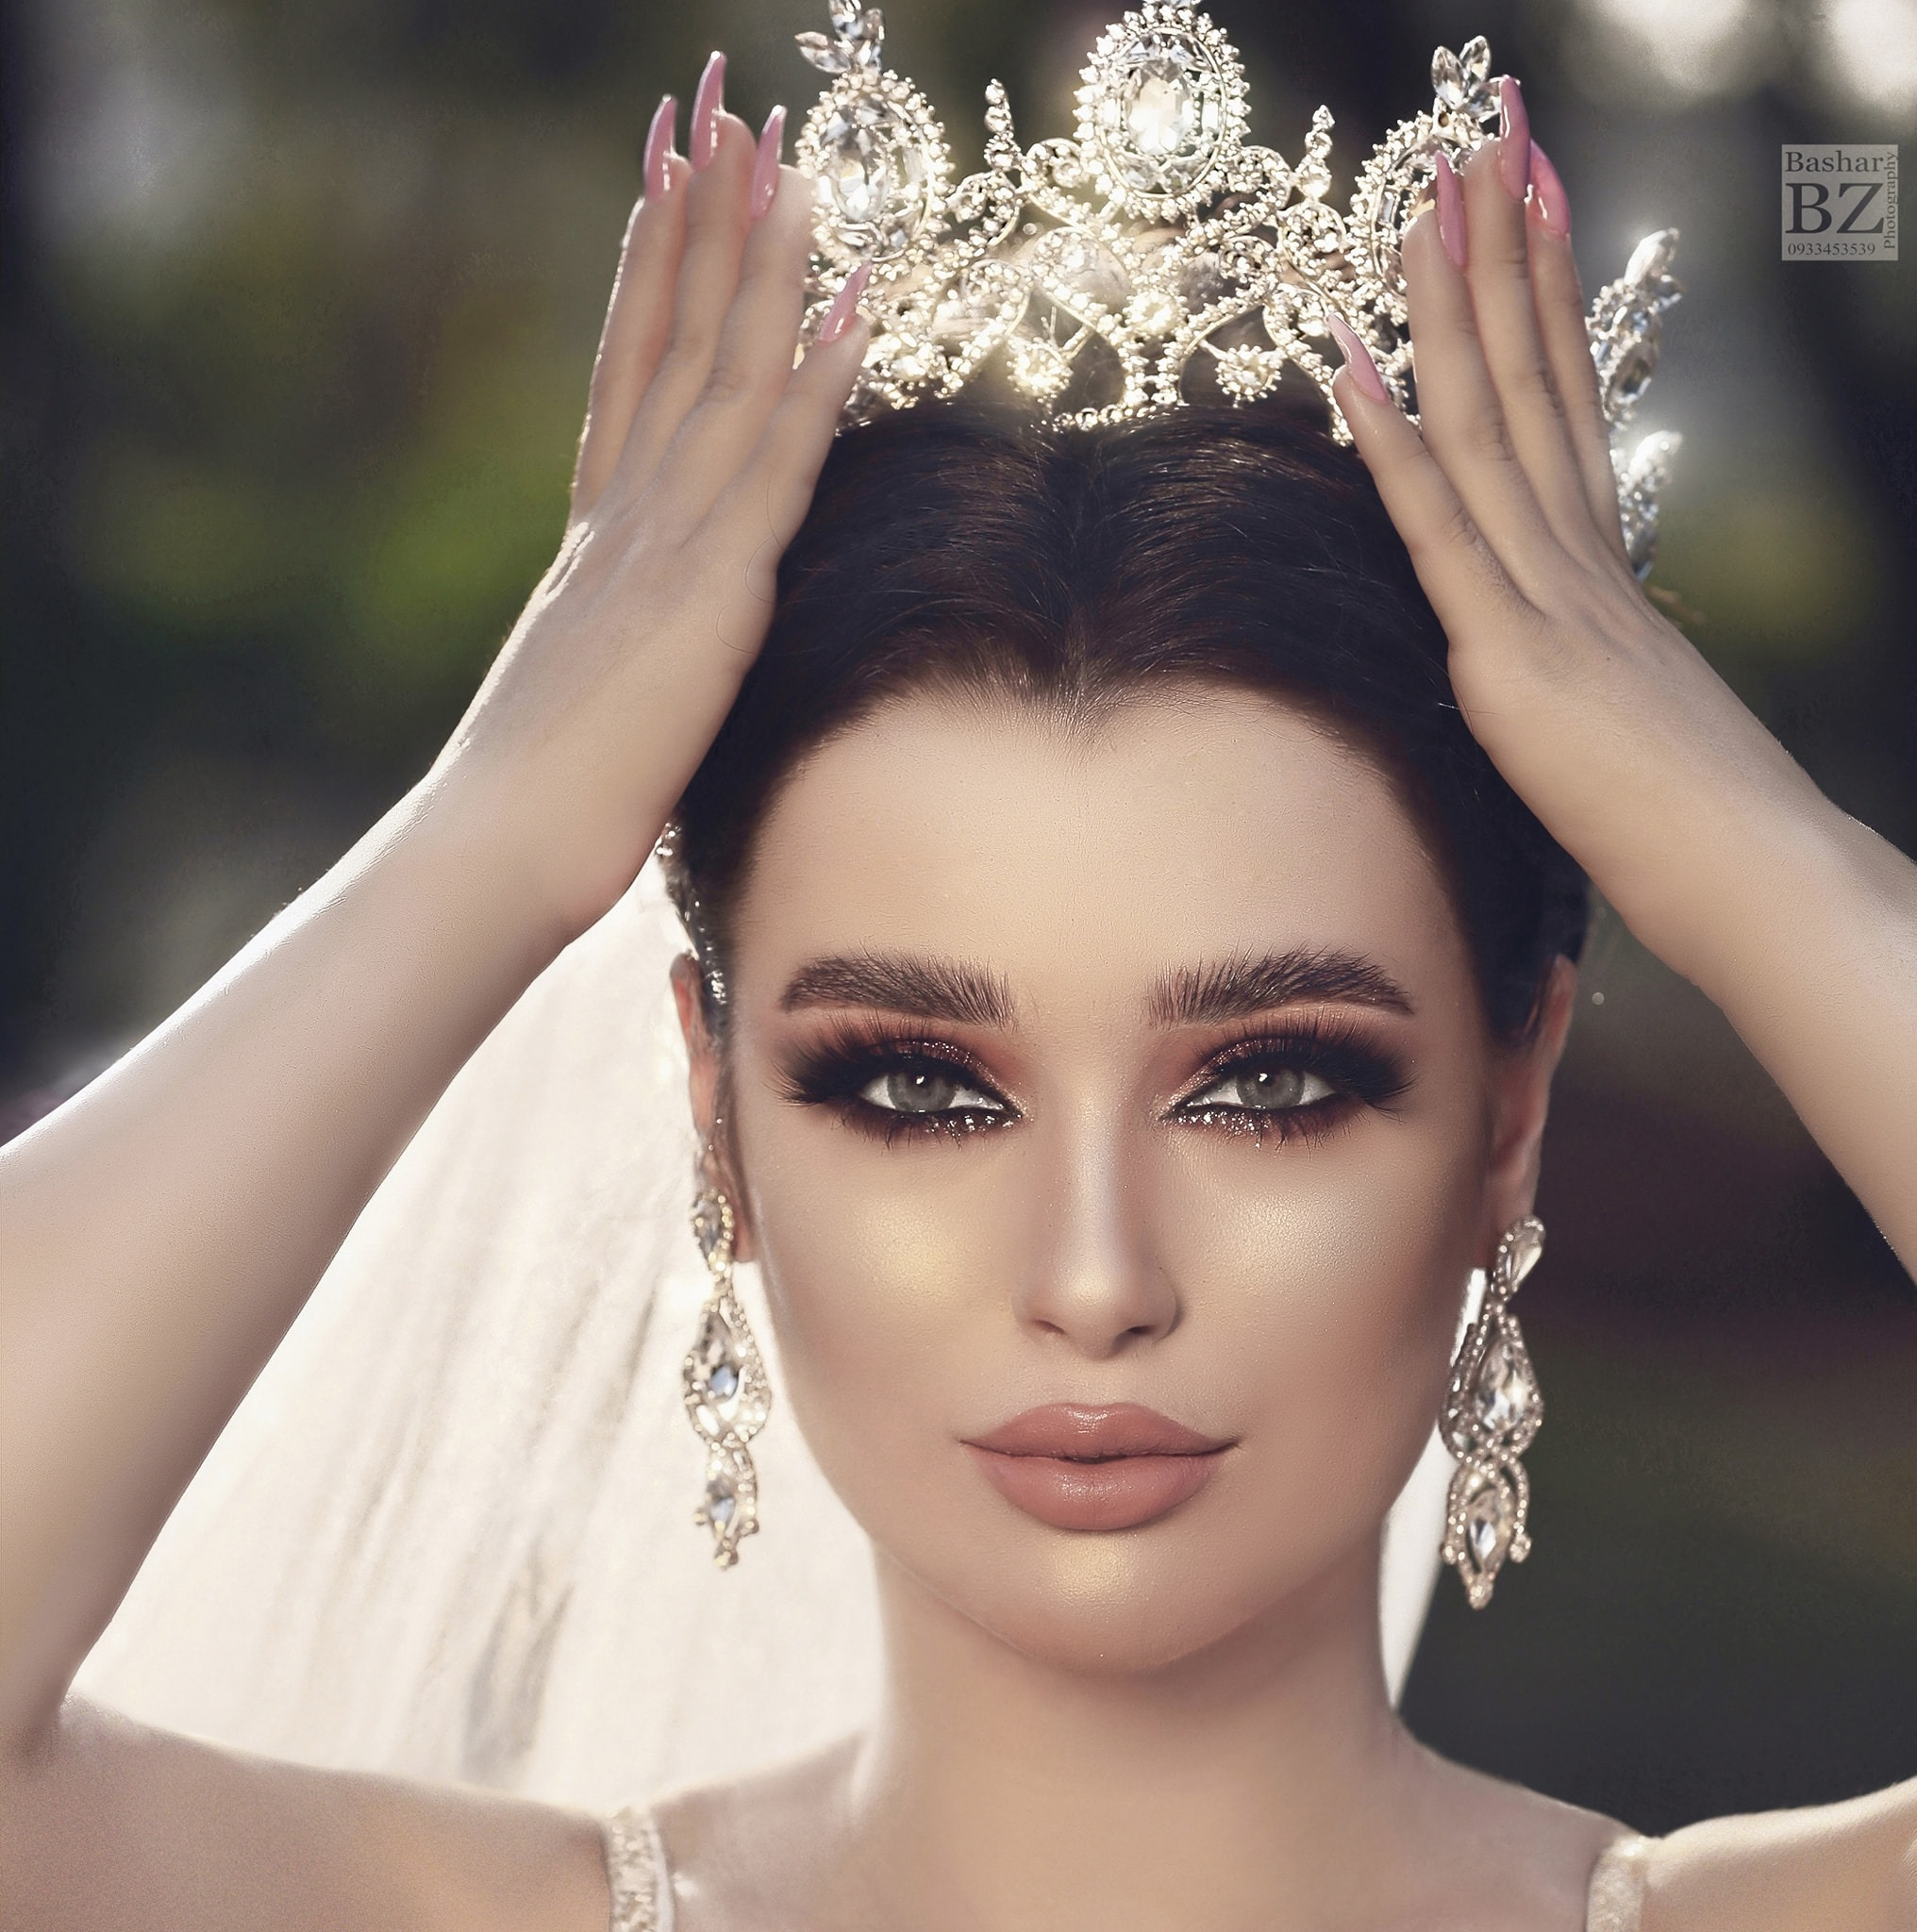 ميك أب علي بشير - Makeup Ali Basheer